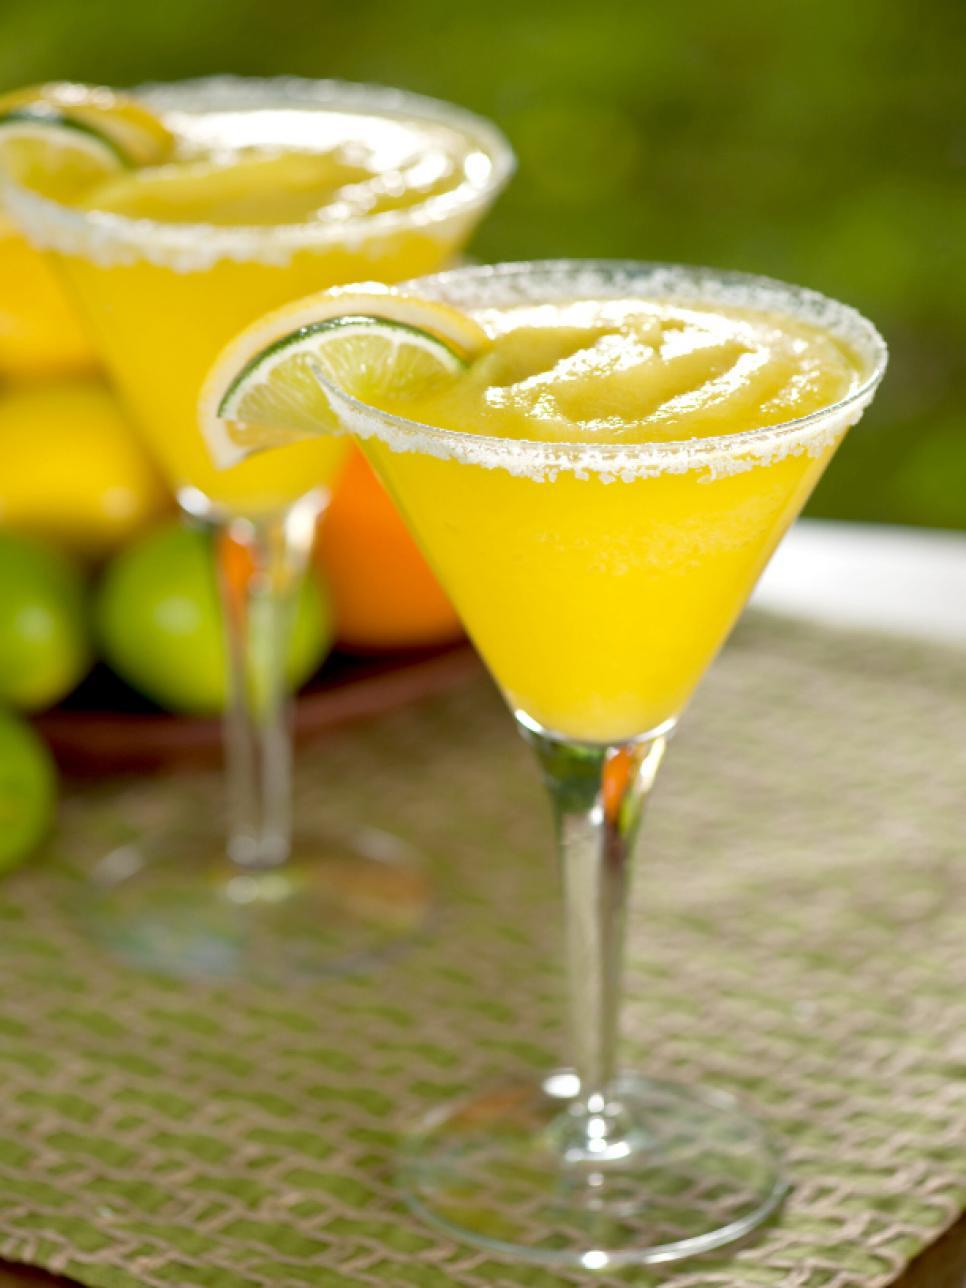 Over-the-Top Citrus Margaritas